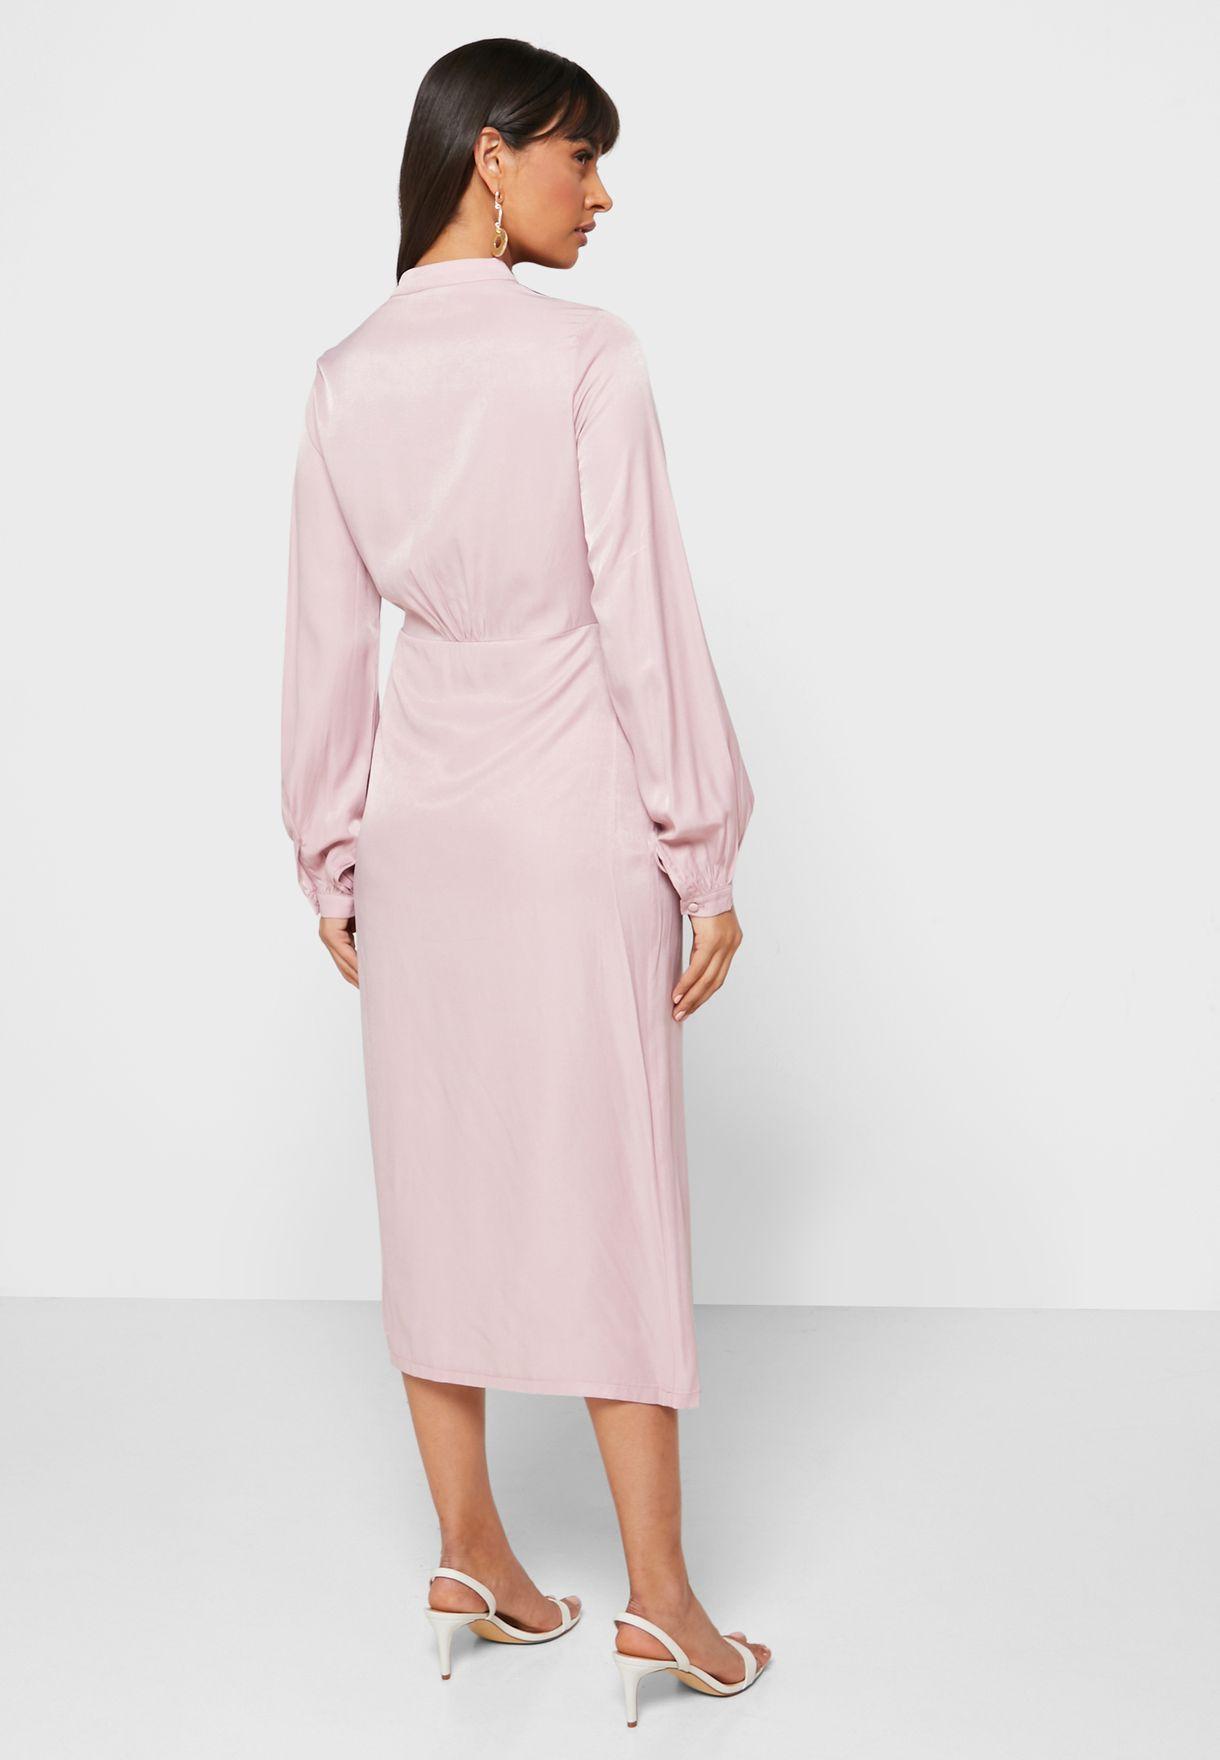 Puffed Sleeve Button Down Midi Dress